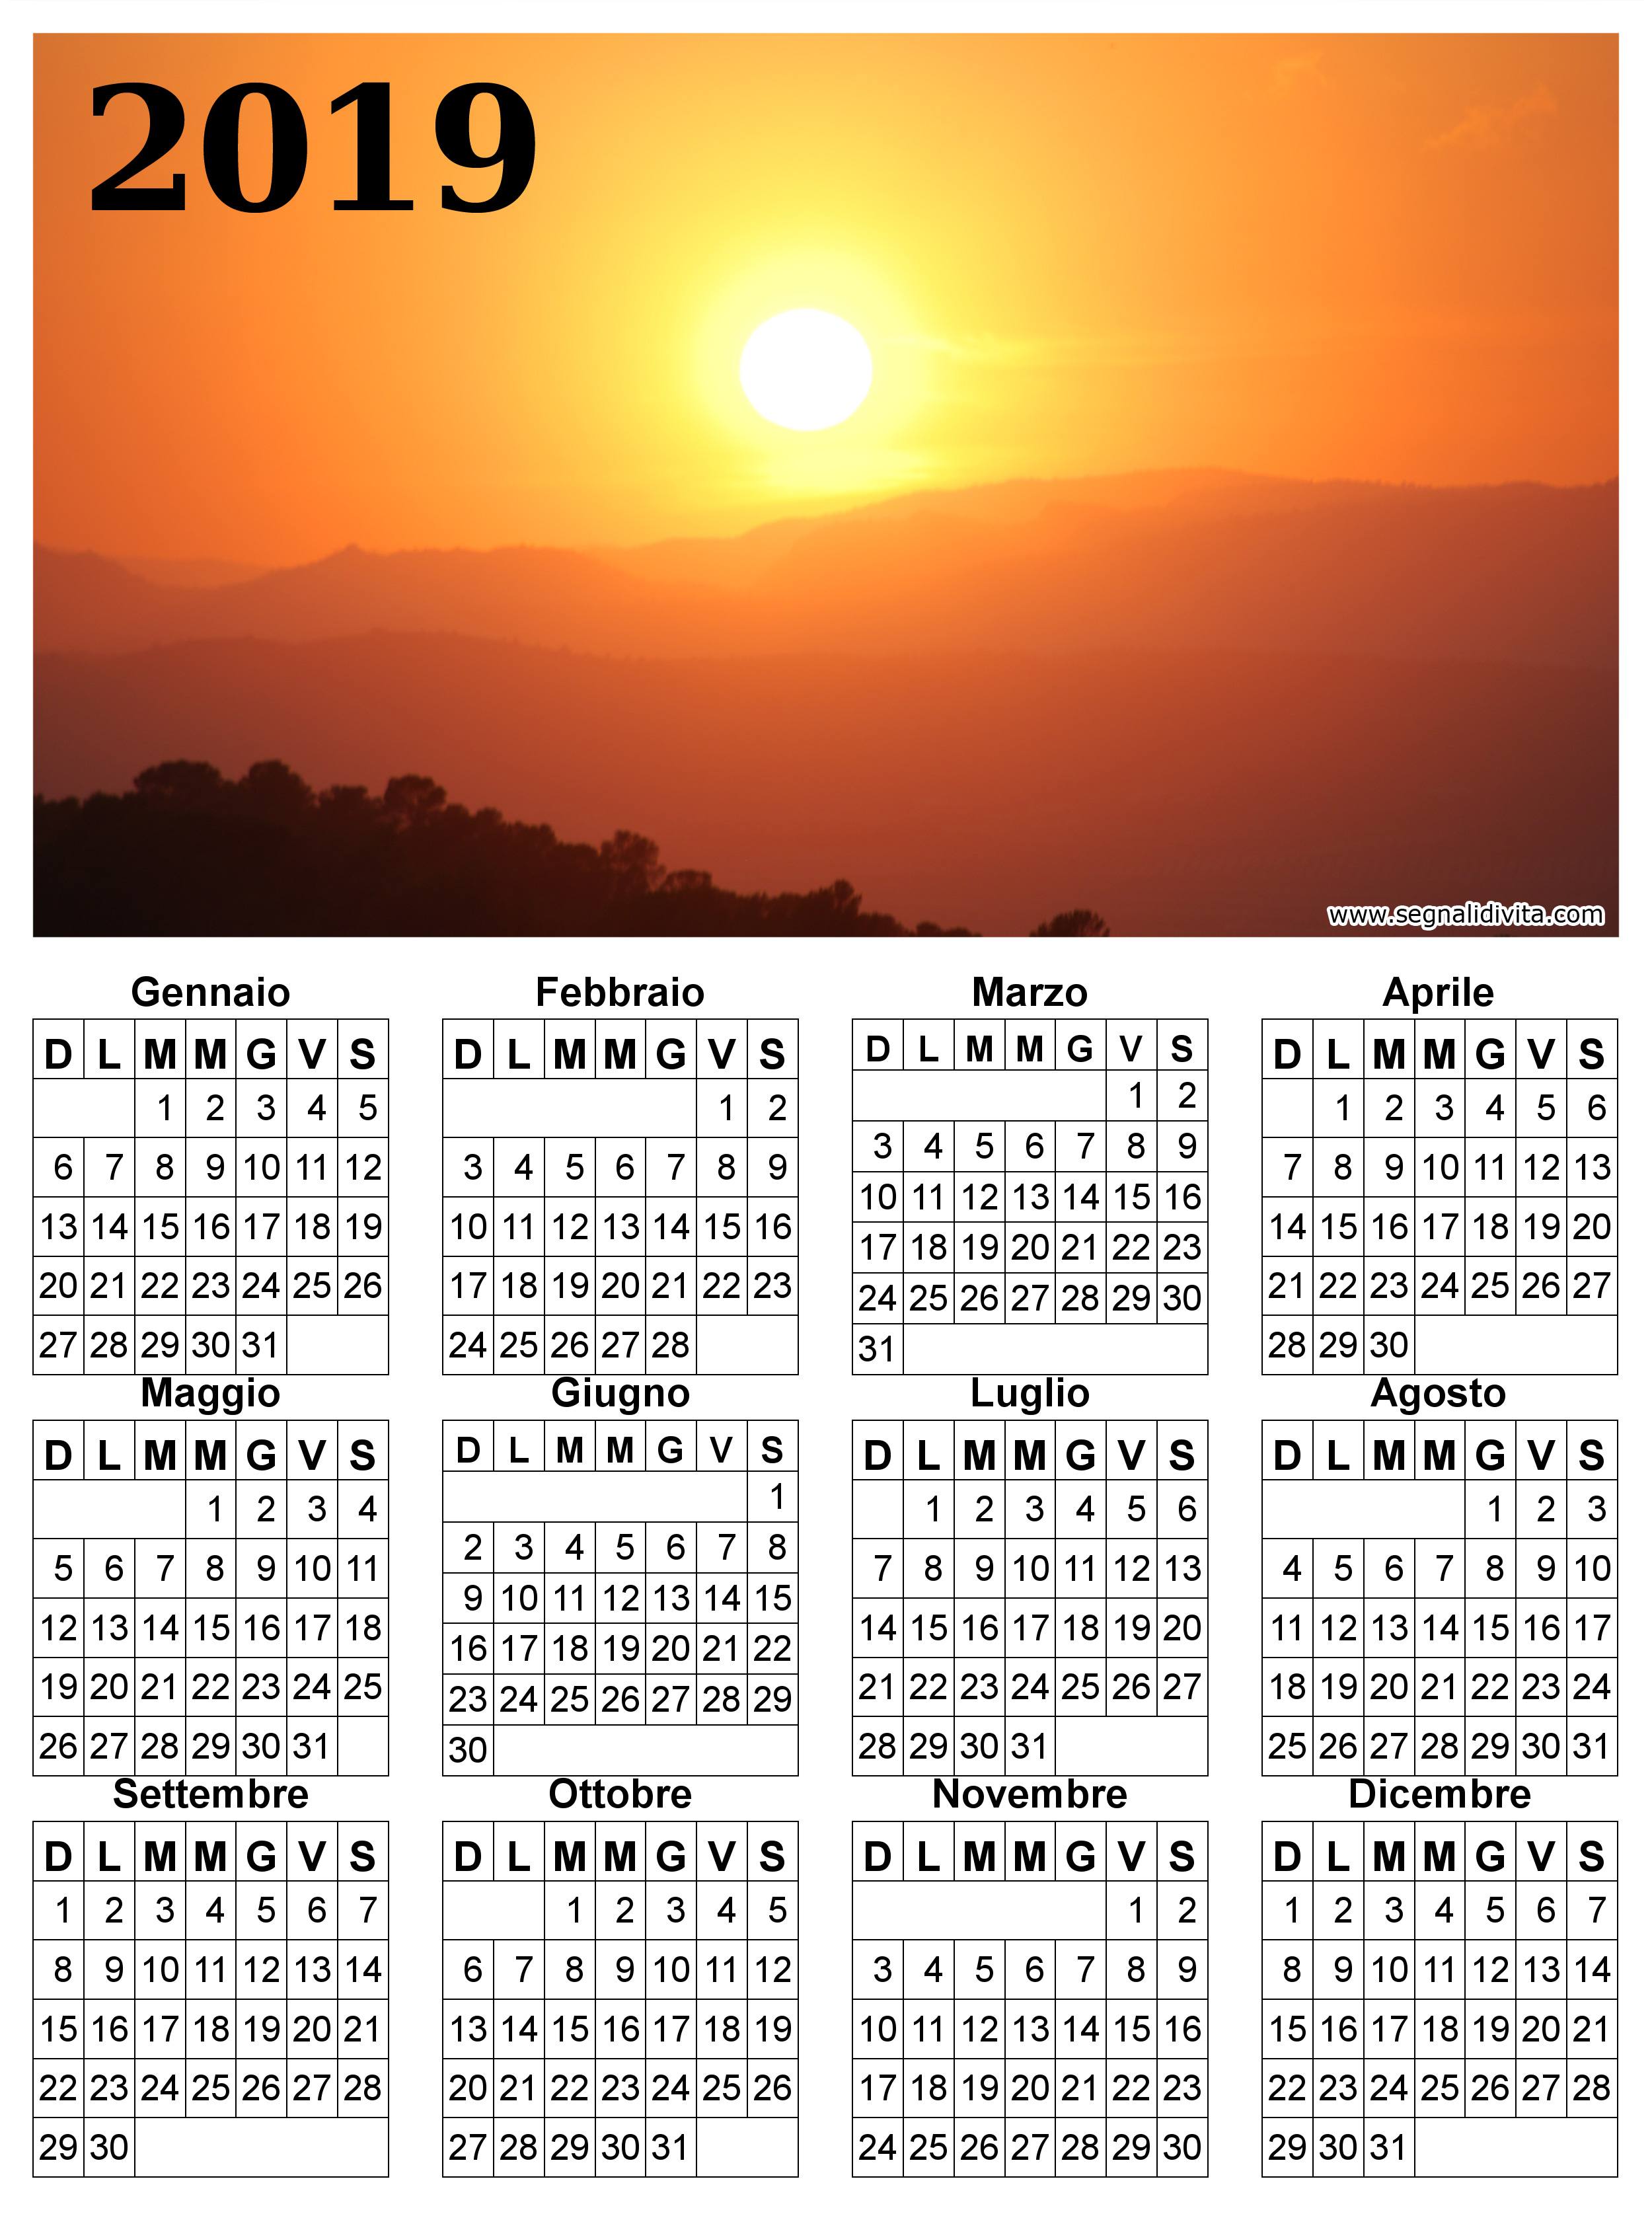 Calendario radioso del 2019